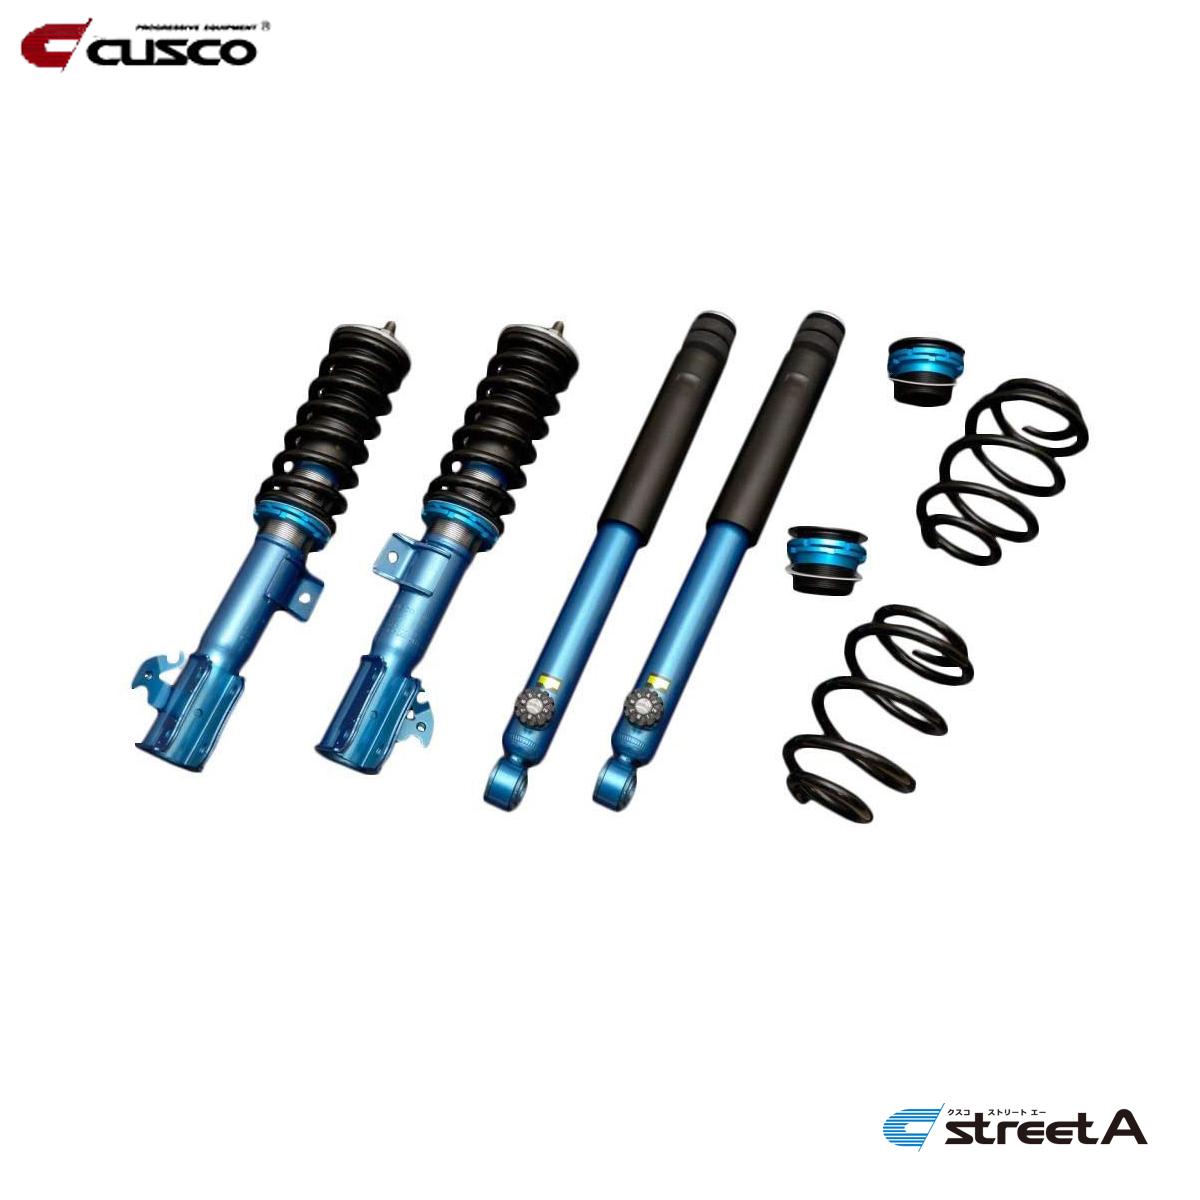 CUSCO クスコ アルファードハイブリッド ヴェルファイアハイブリッド ATH20W 車高調 全長固定式 945-62J-CB